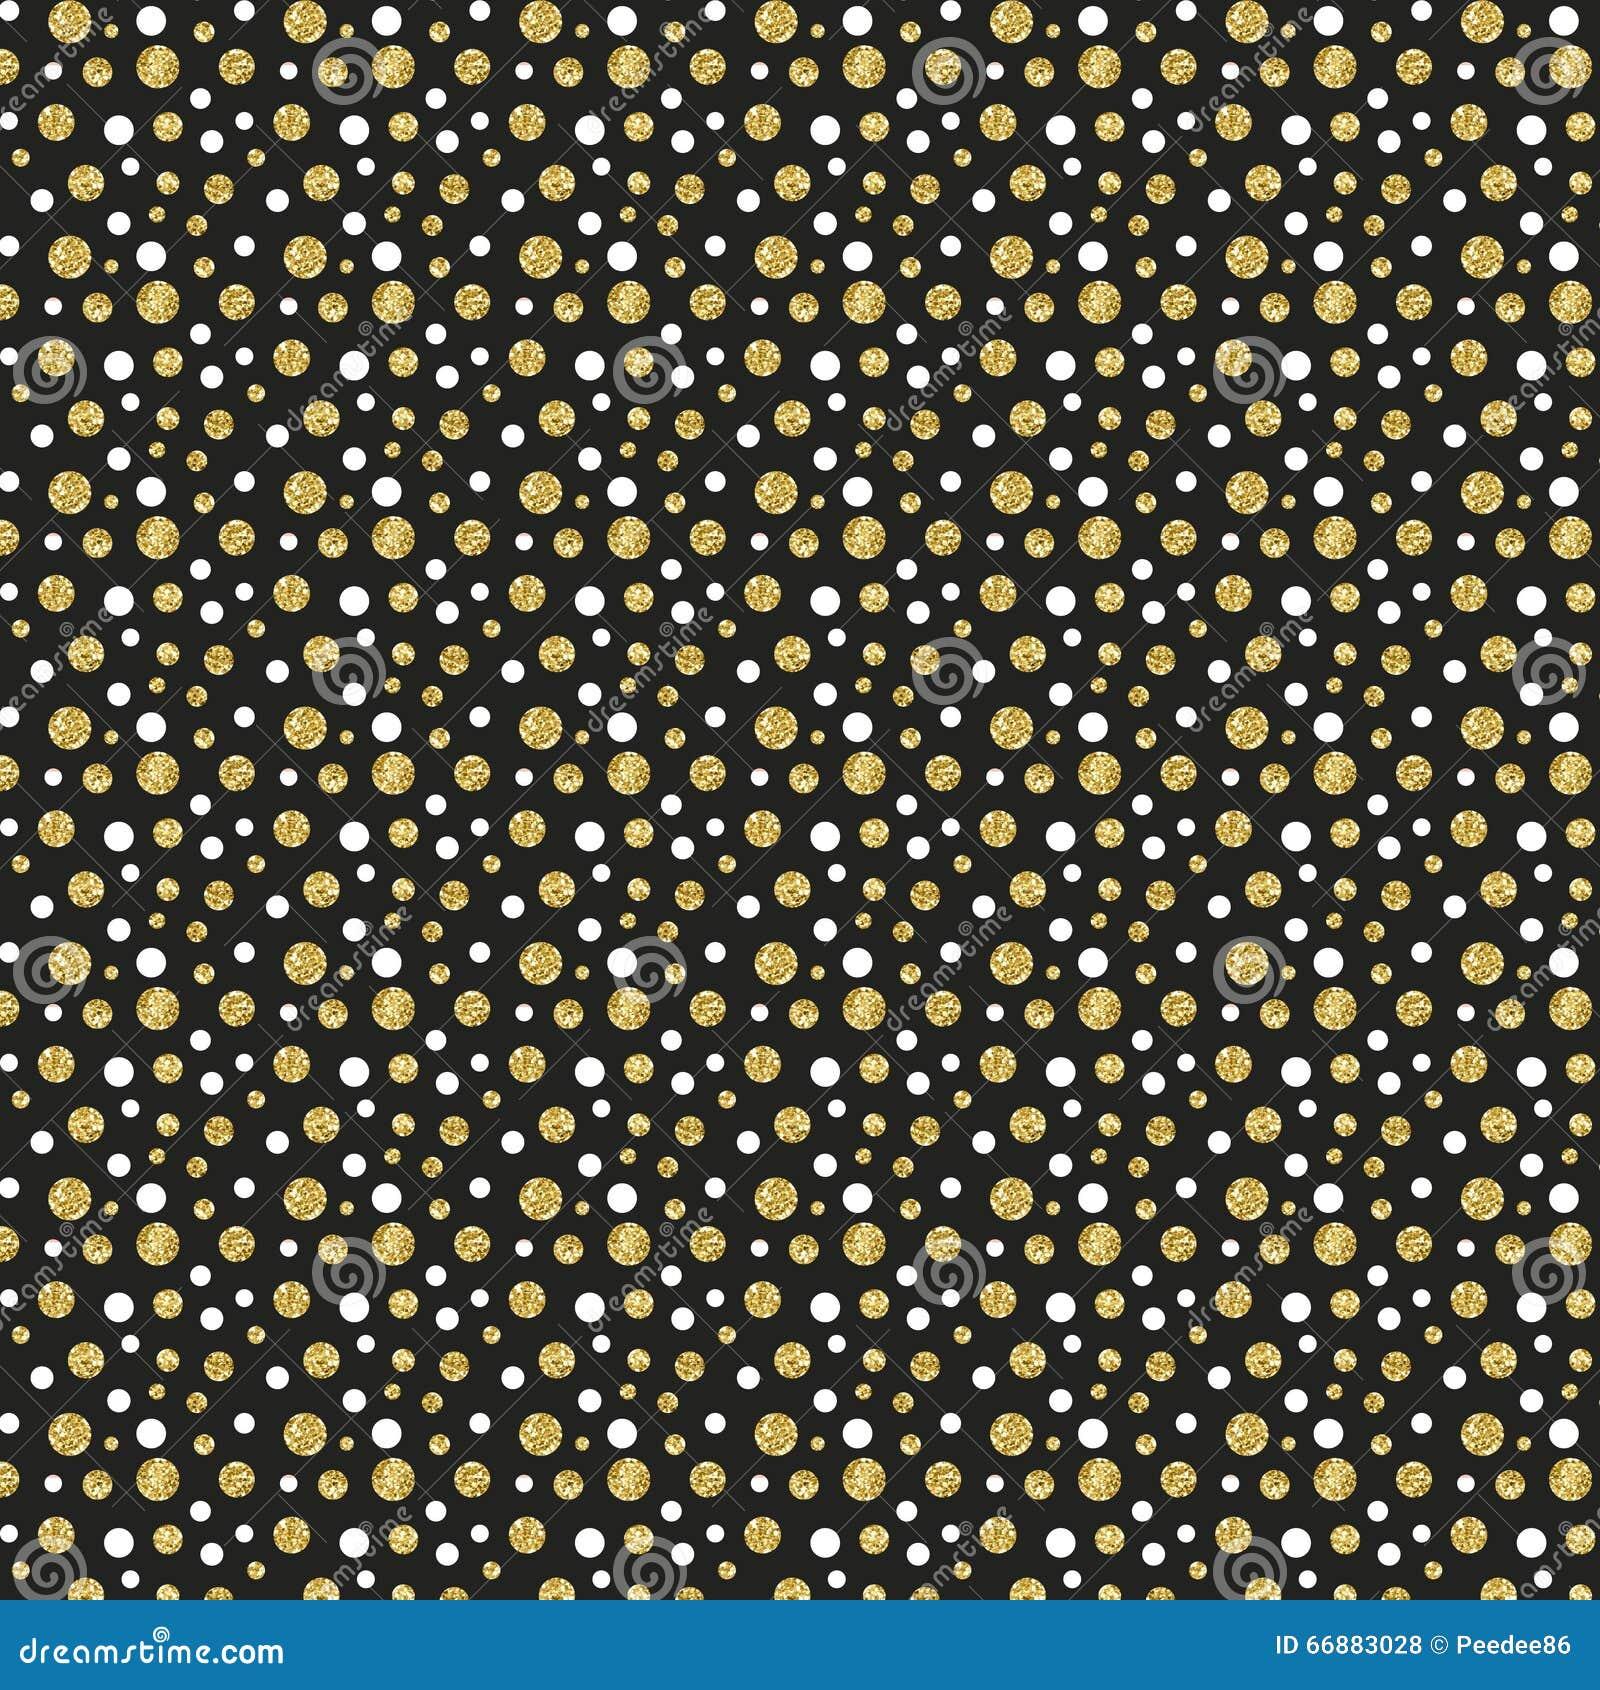 Gold Glitter Dots On Black Background Stock Illustration